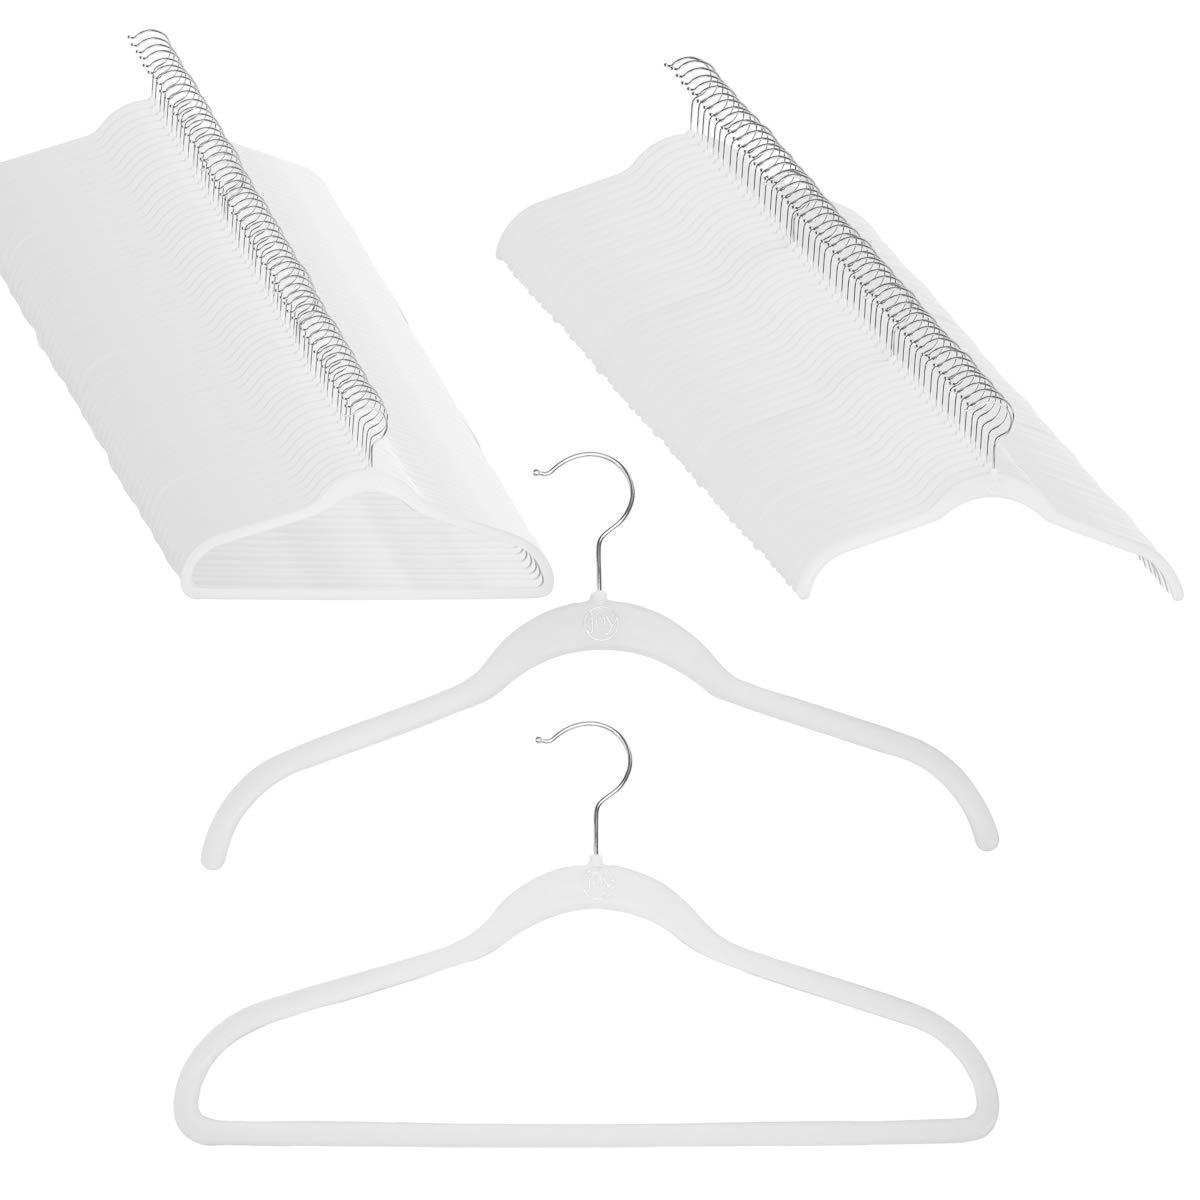 Joy Mangano 120 Pack White Huggable Hangers Non Slip Velvet Hangers Space Saving Clothes Hangers by Joy Mangano